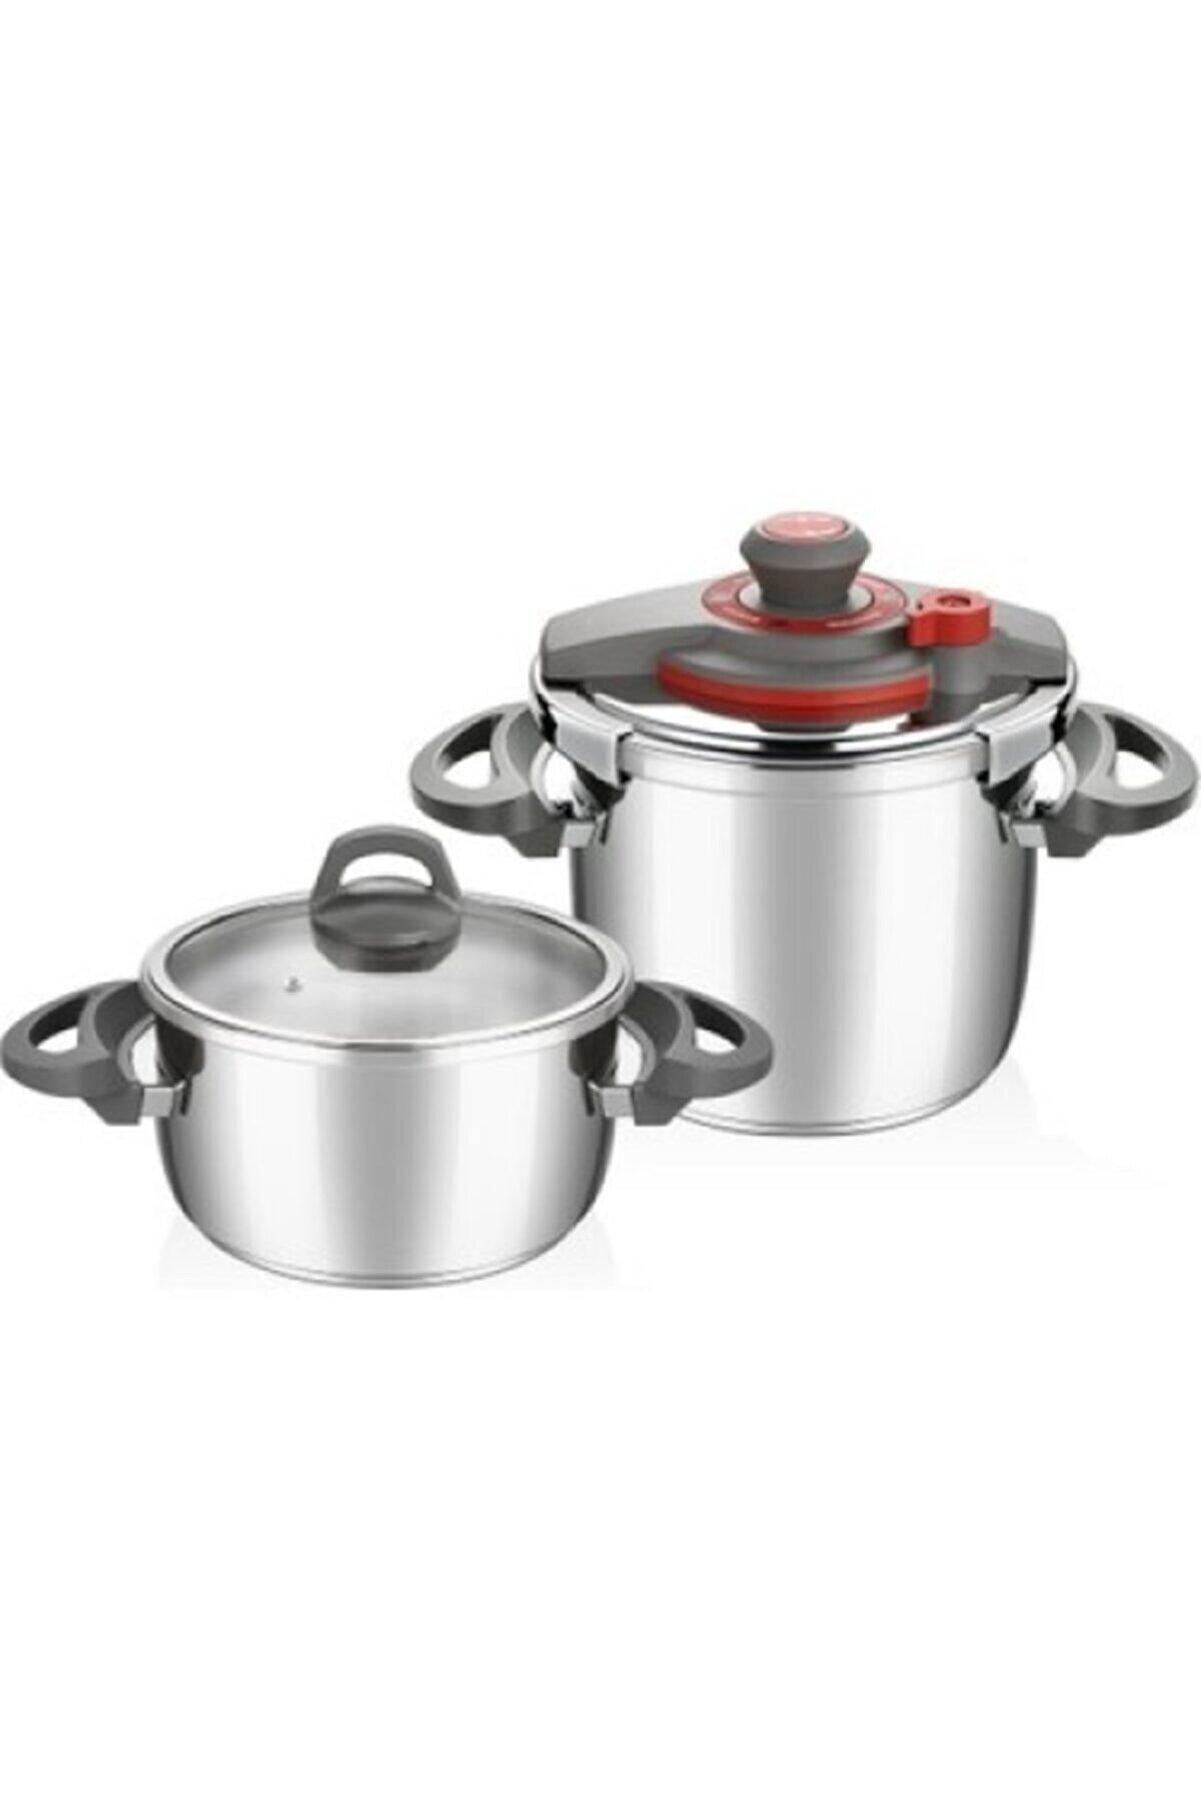 Falez 22 Cm Profi Cook Premium 4+7lt Düdüklü 2 li Tencere Seti